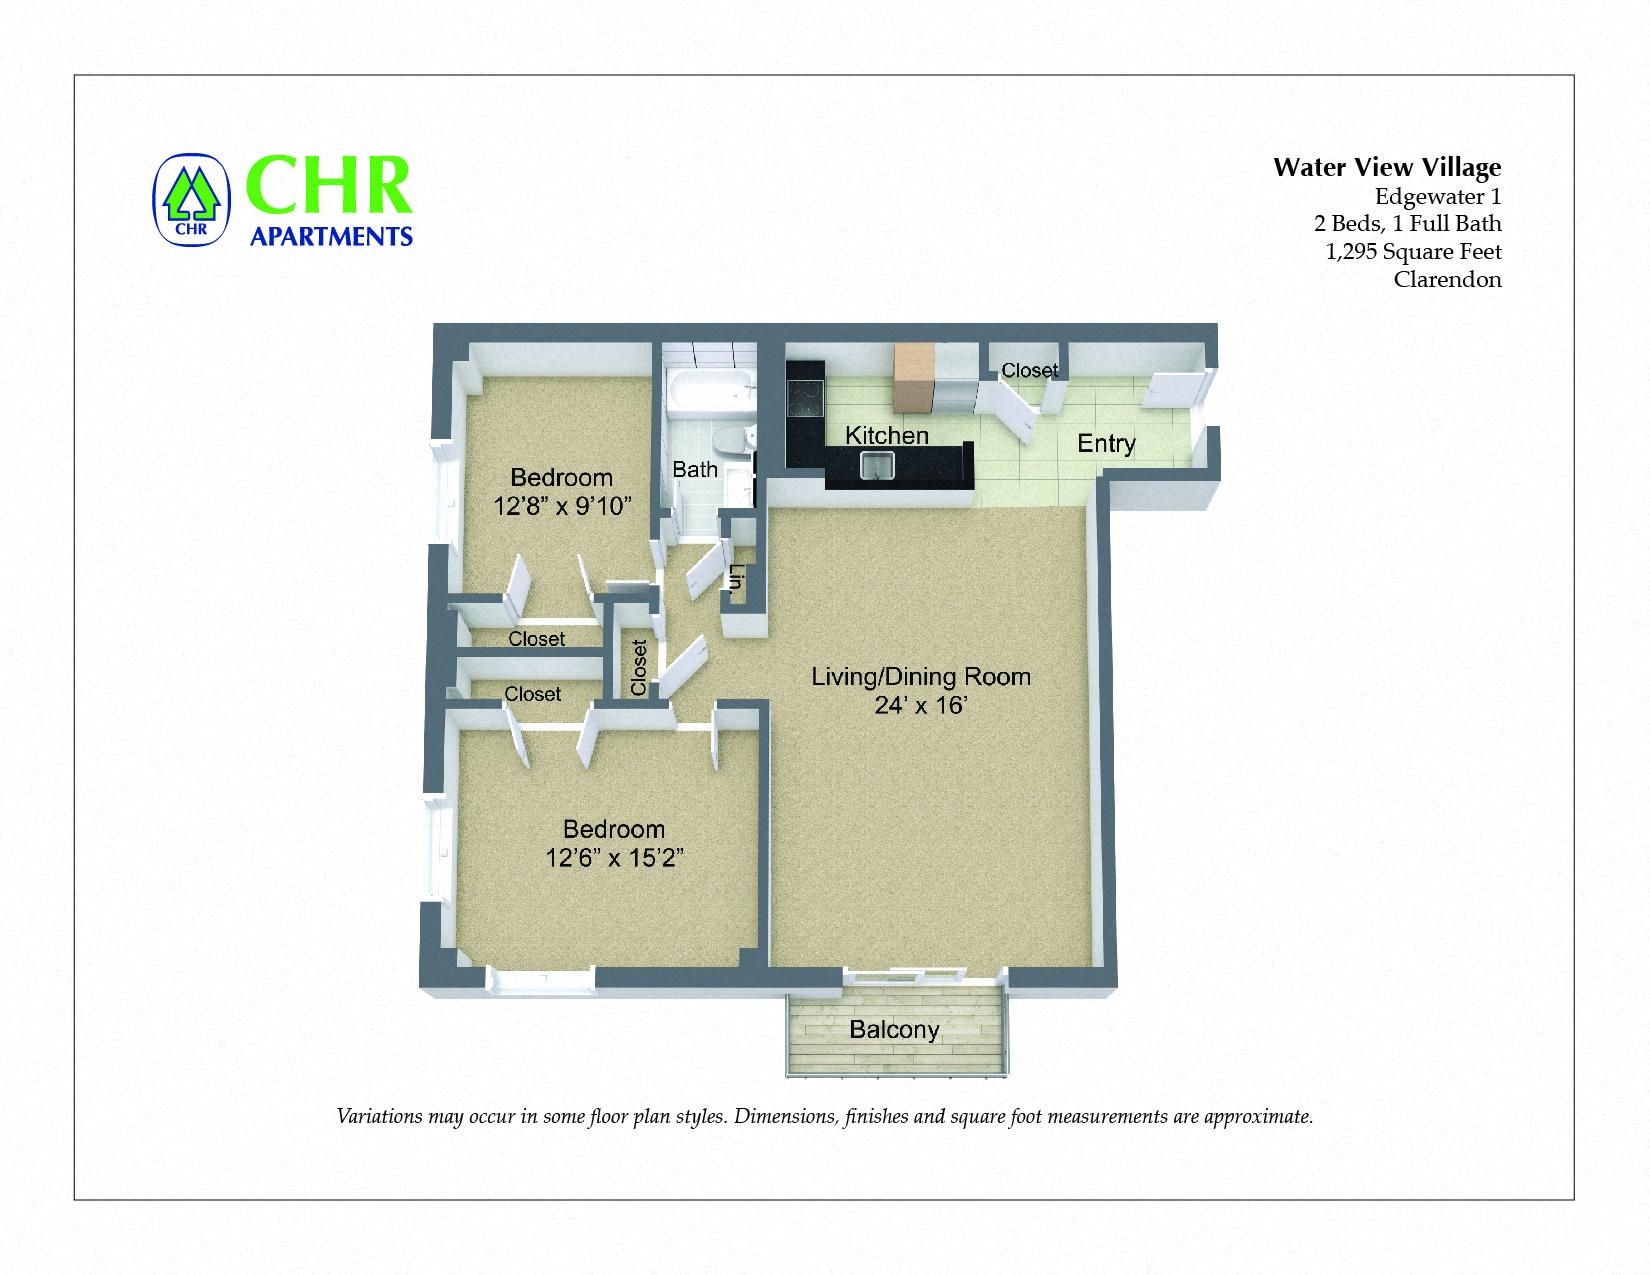 Click to view 2 Bedroom Corner Unit with Balcony floor plan gallery